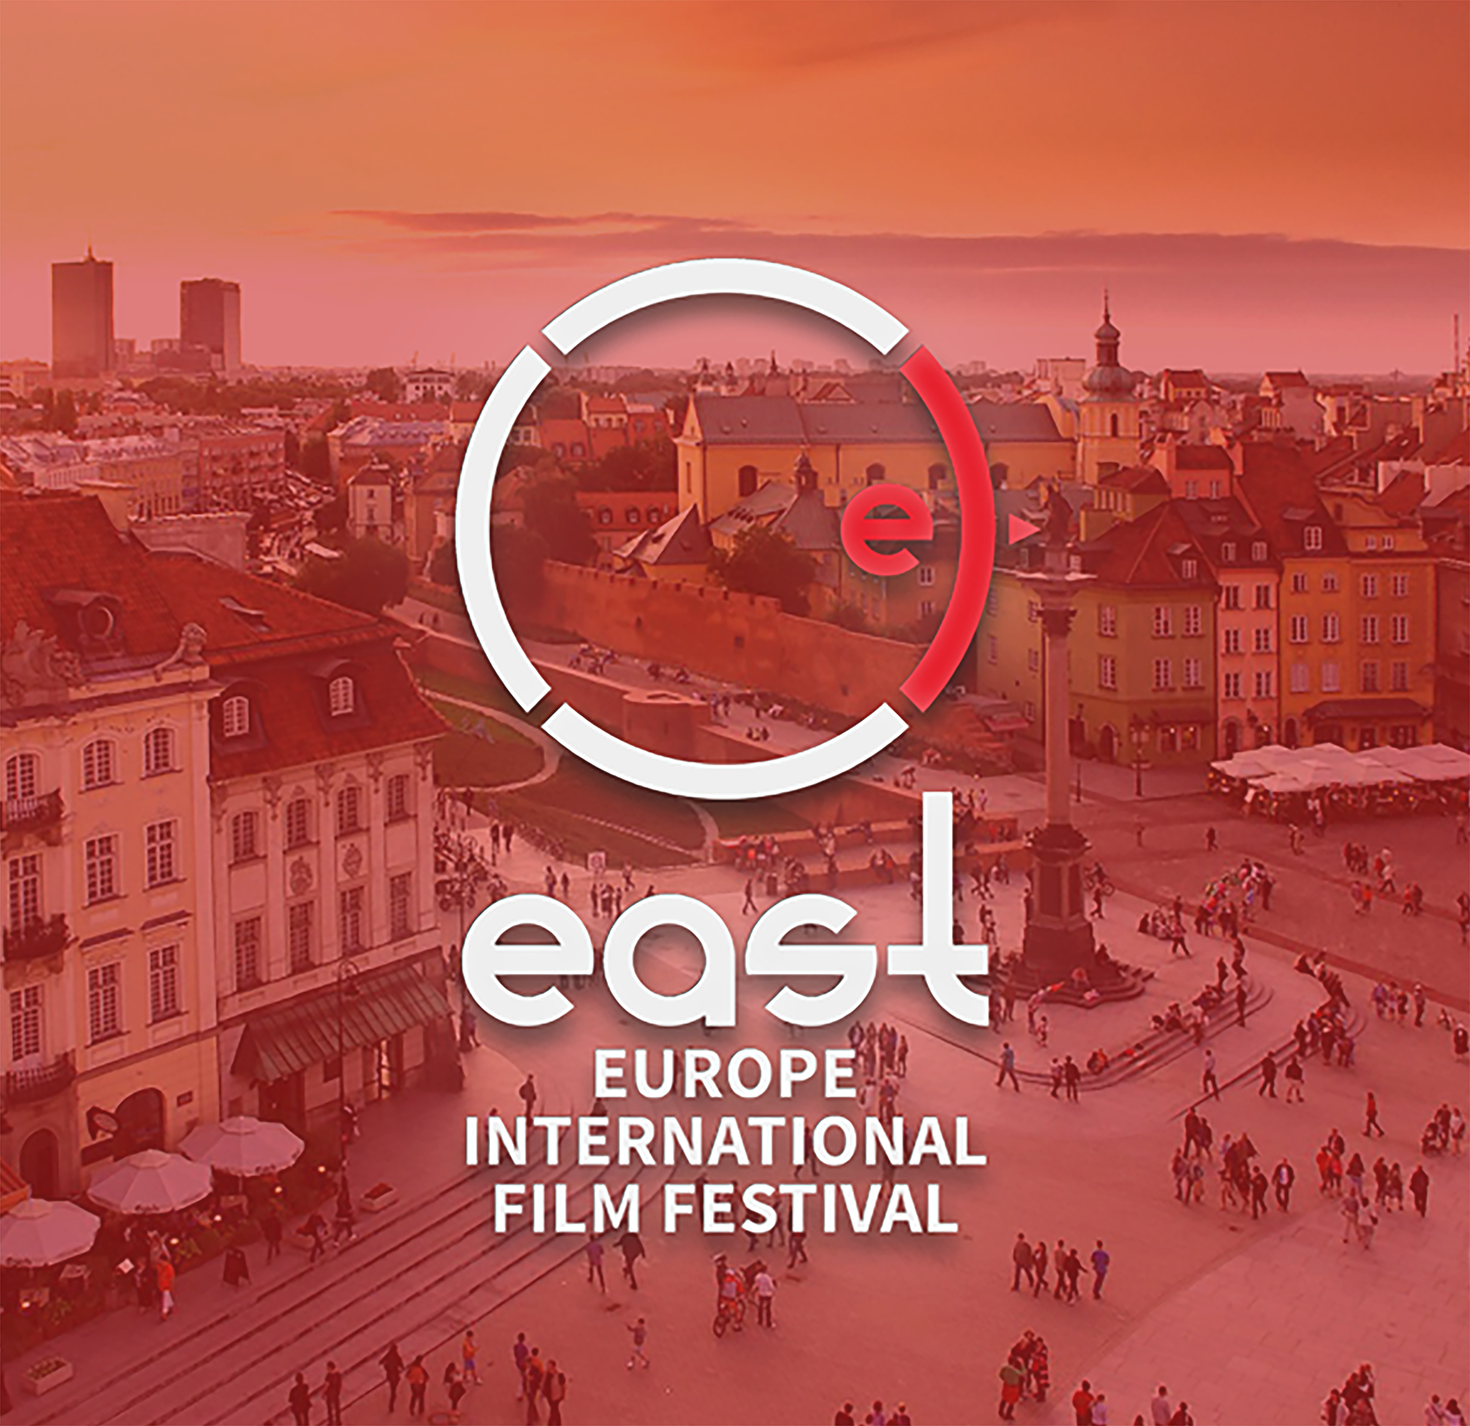 East Europe International Film Festival.png